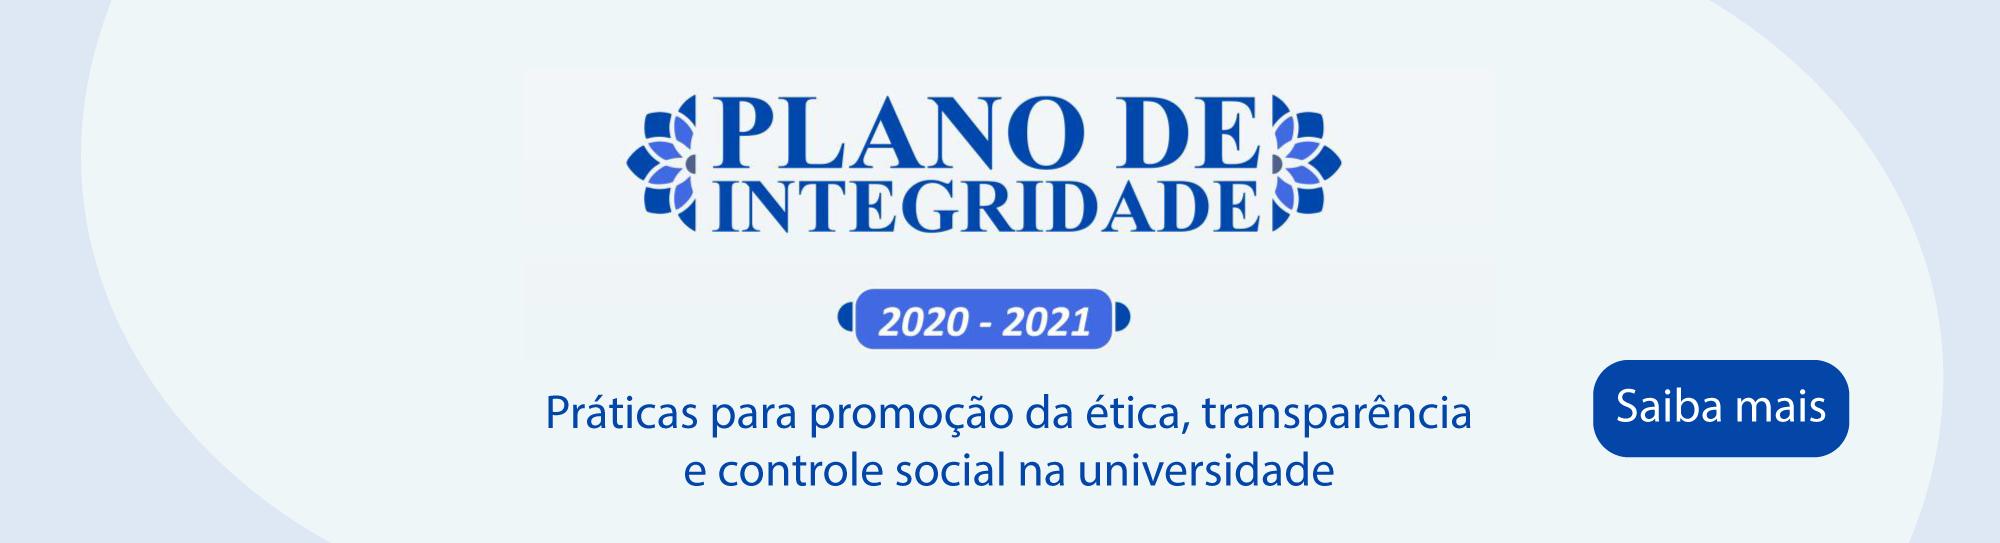 Plano de Integridade